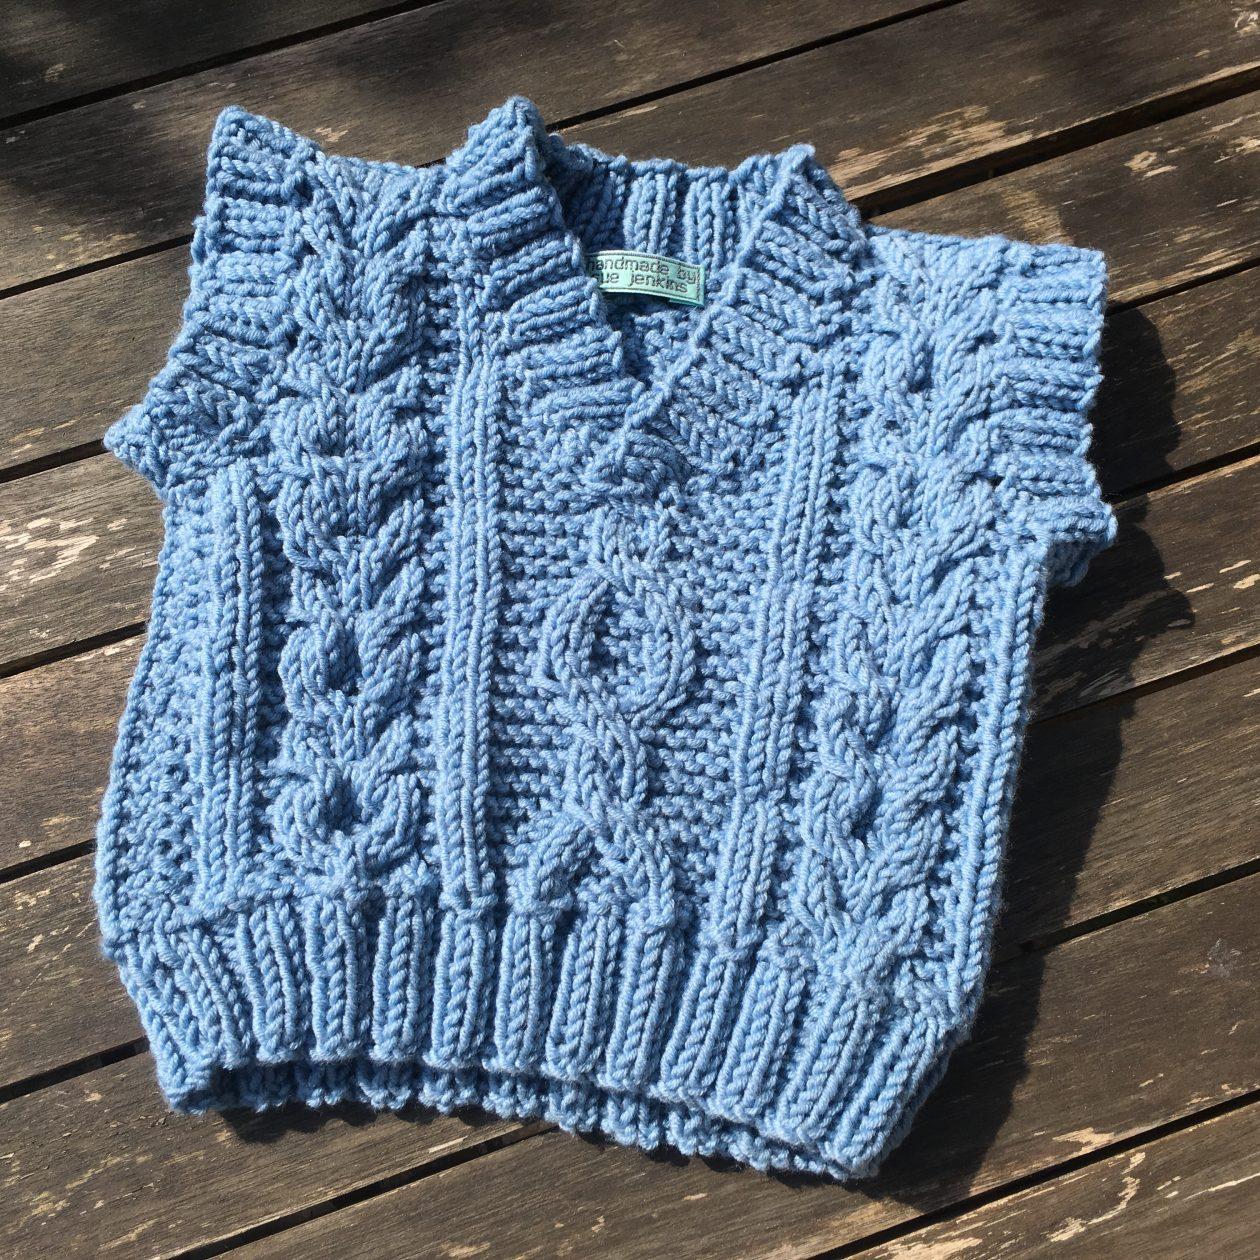 Stumps Sweater (6-12 months)